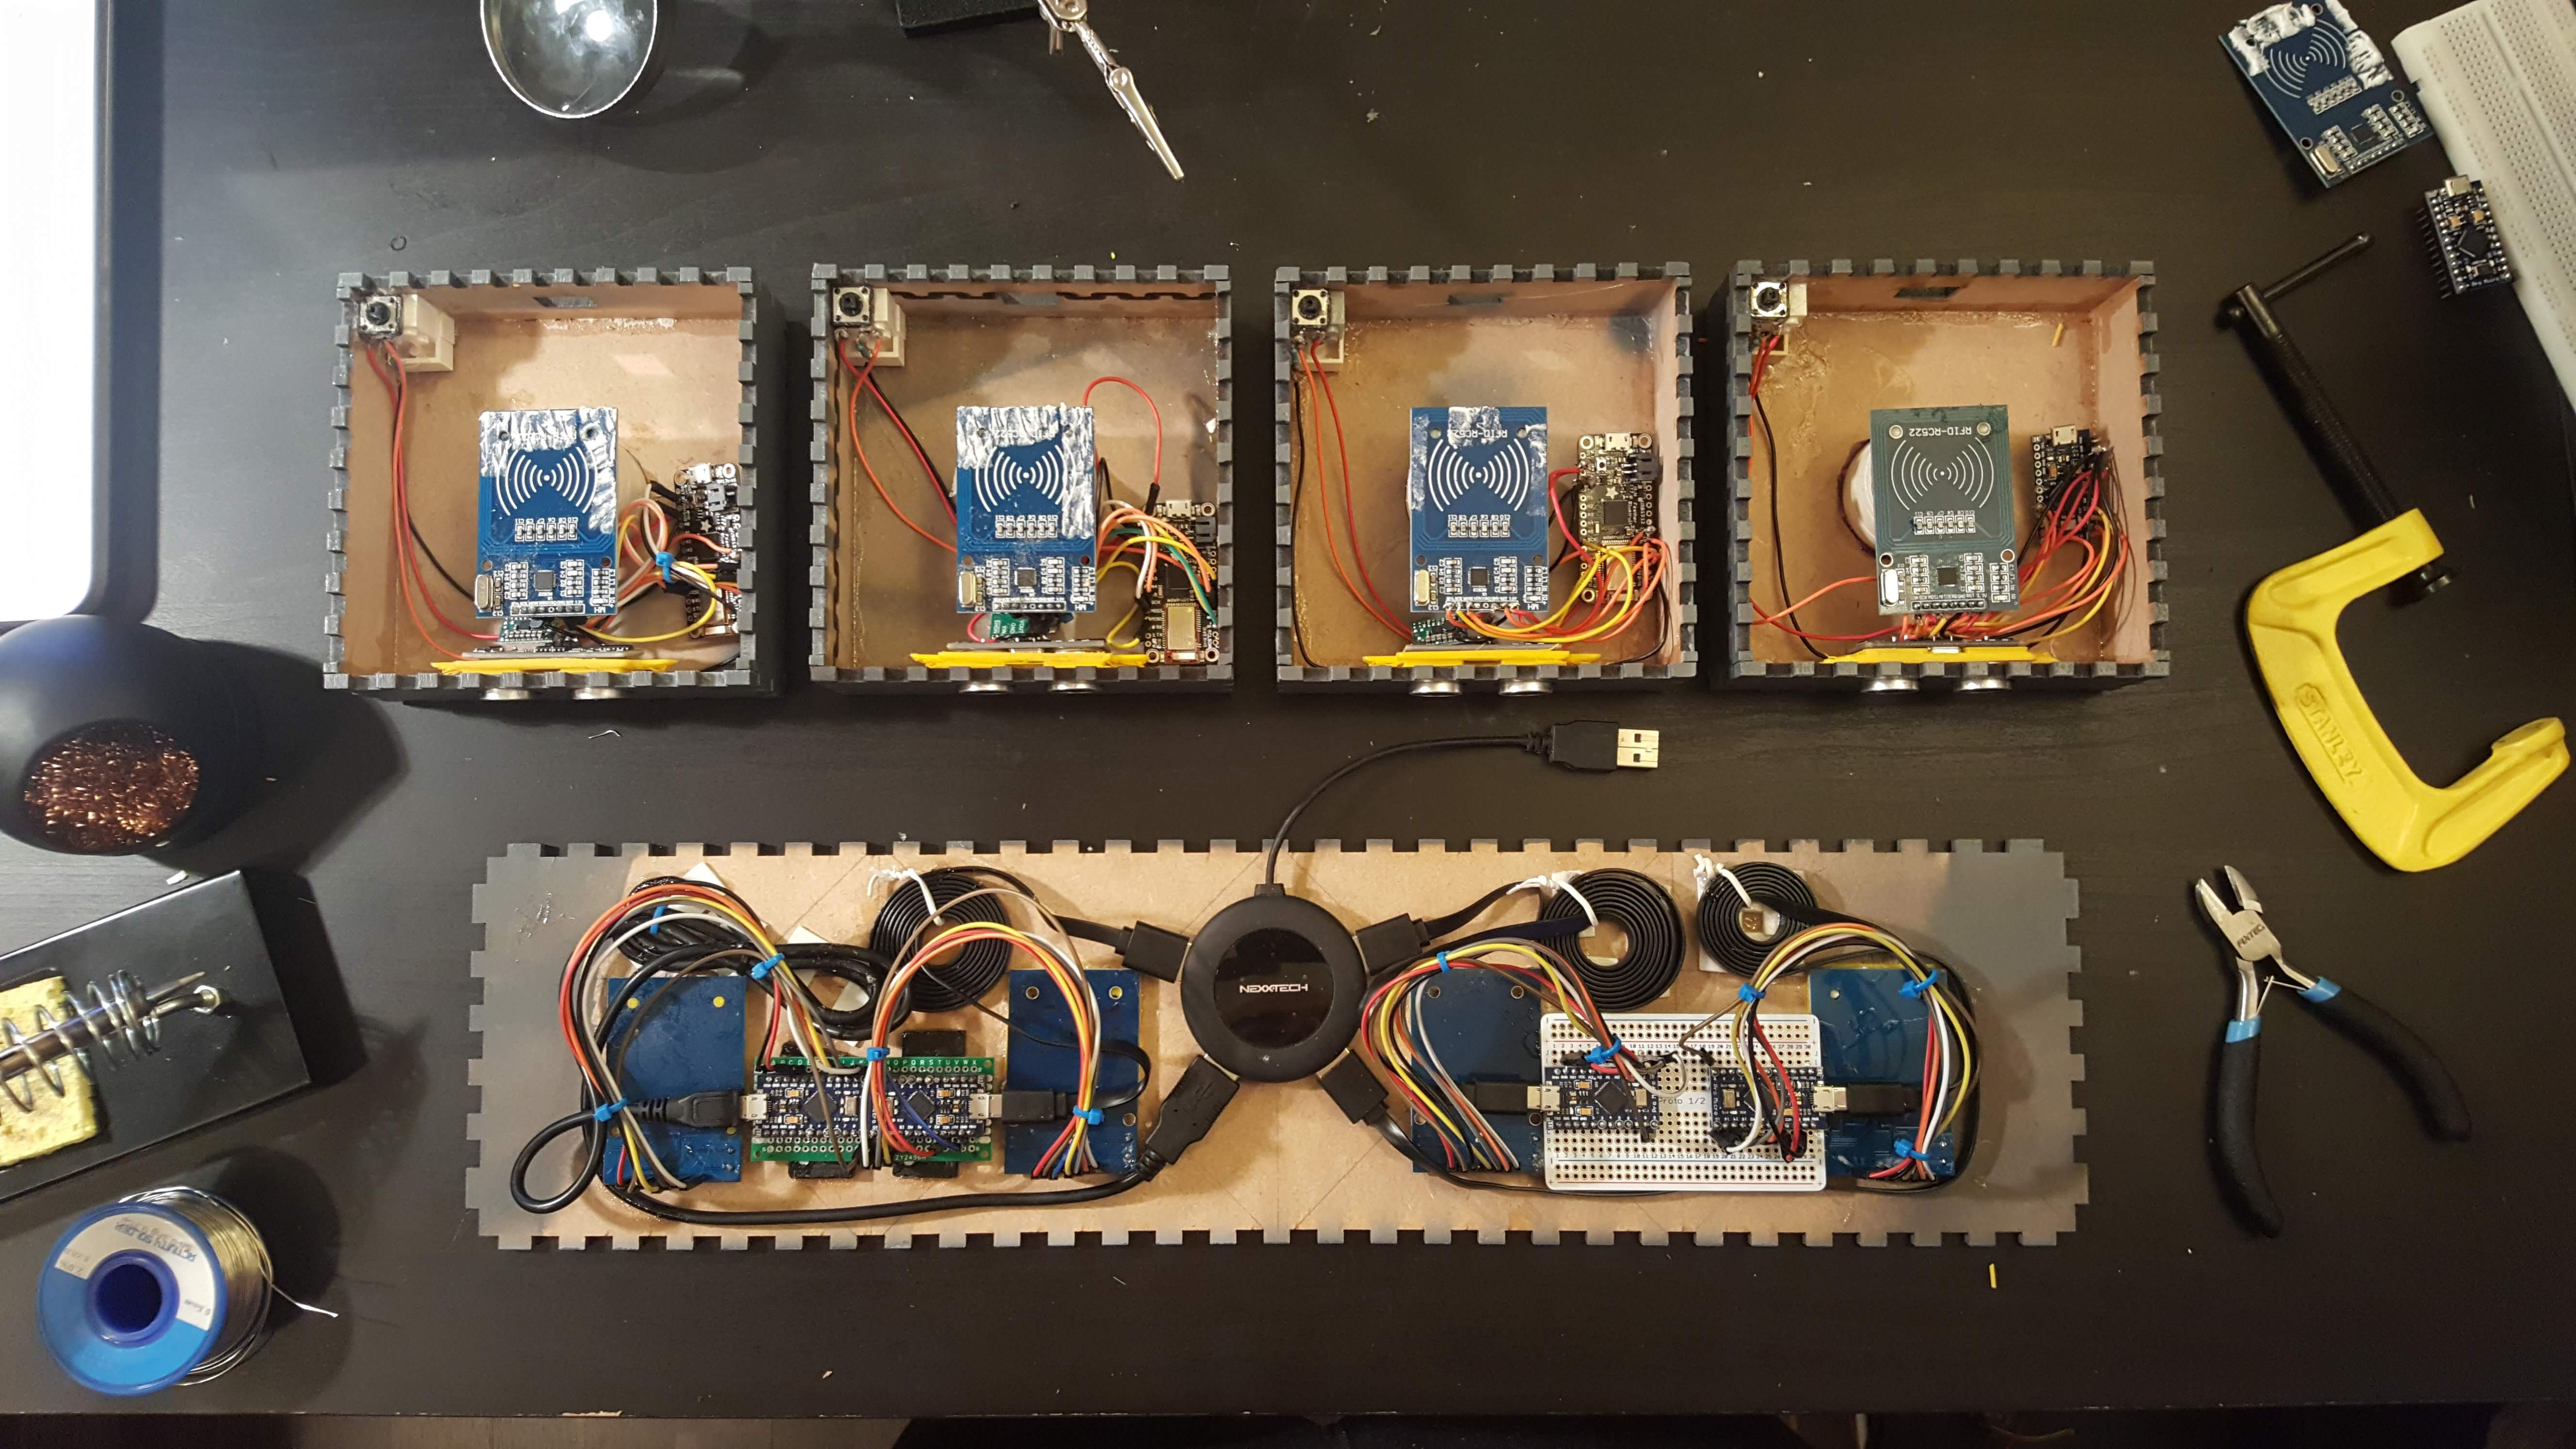 Top-down view of internal electronics